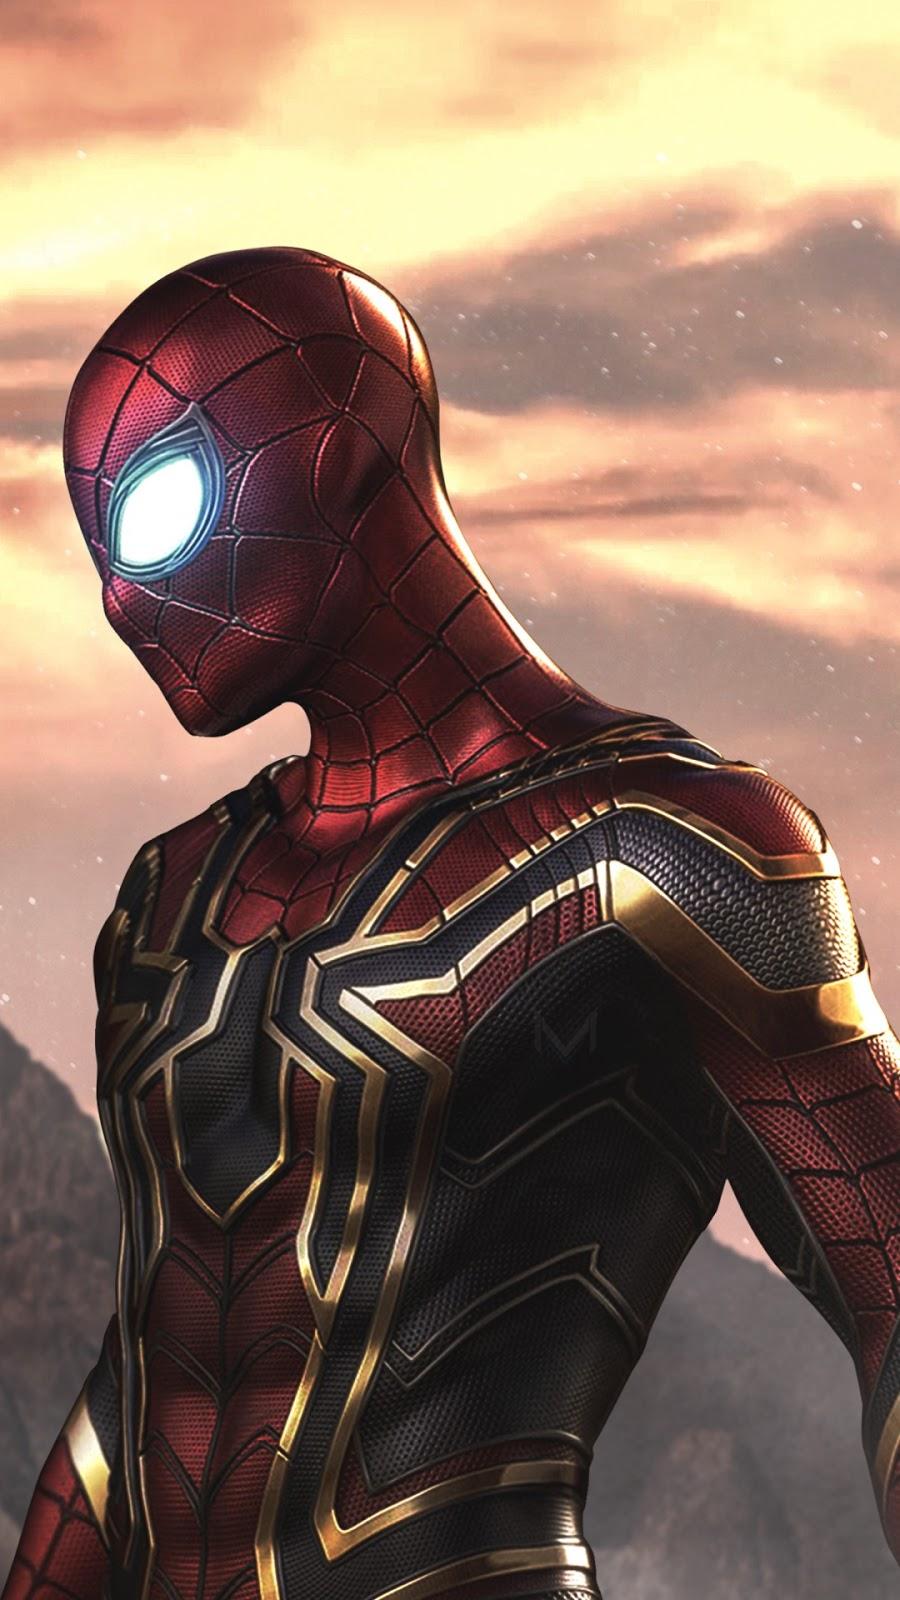 Papel de parede grátis Armadura Spider-Man Iron Spider para PC, Notebook, iPhone, Android e Tablet.